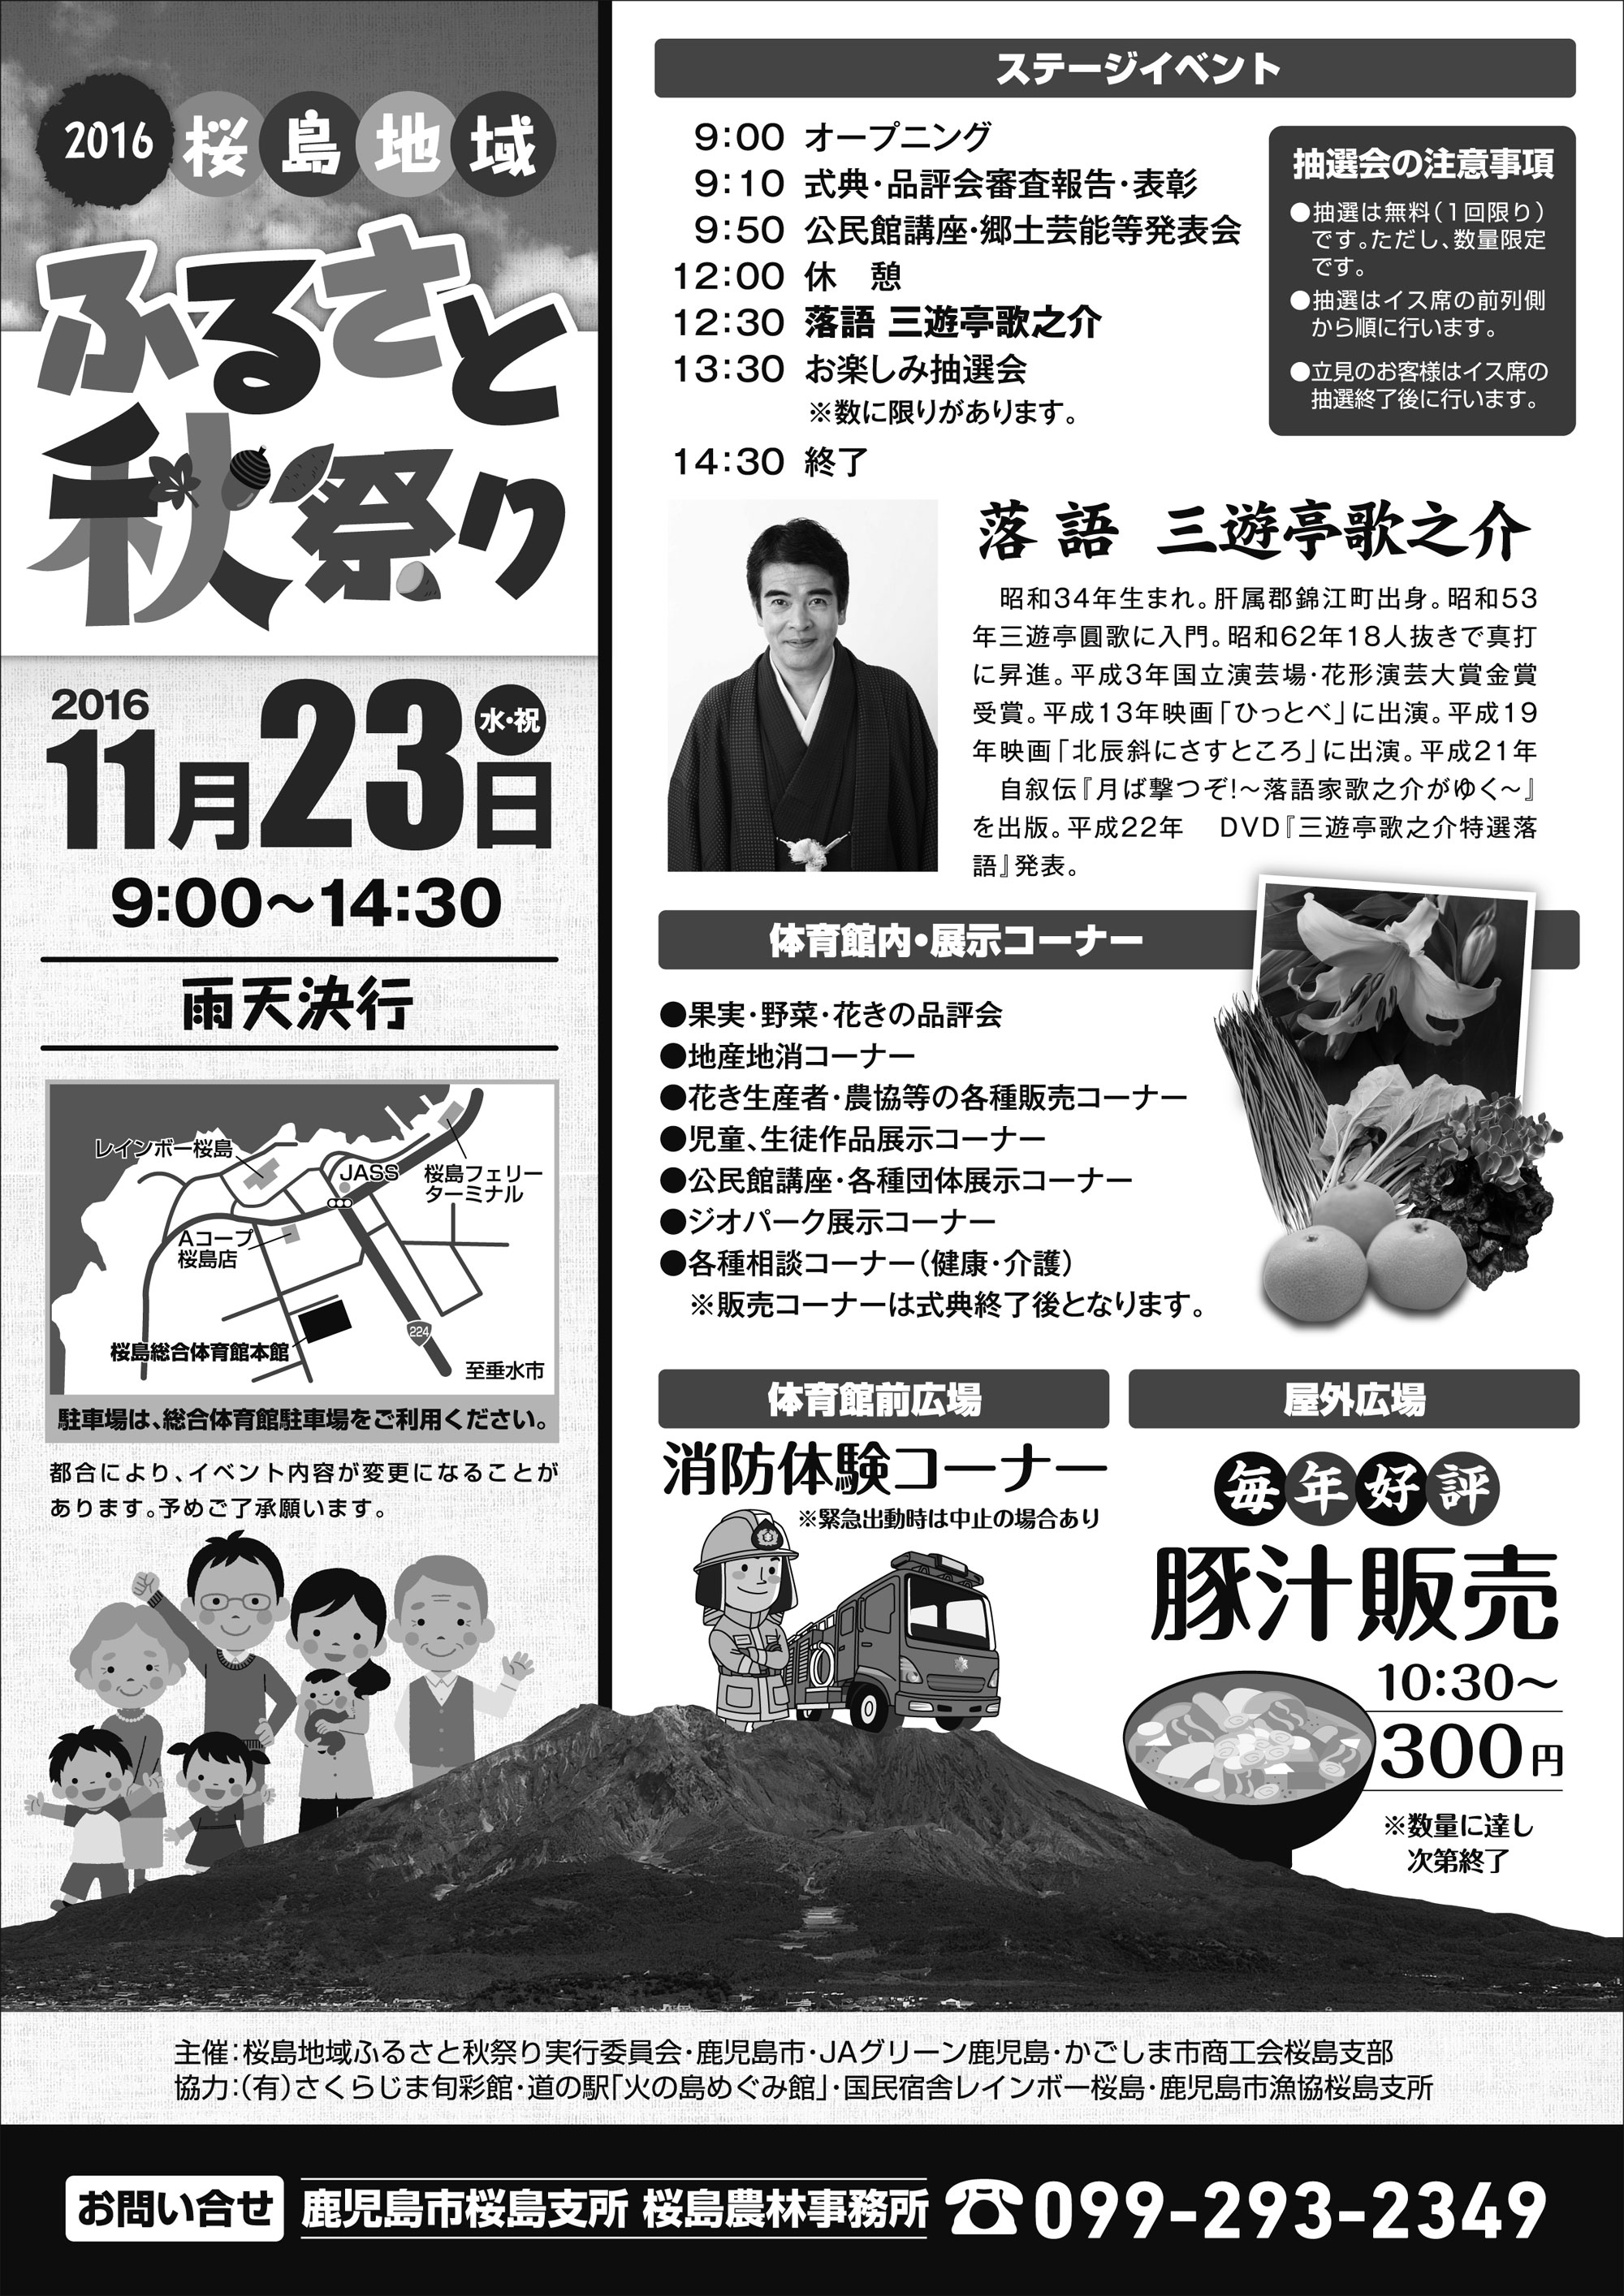 http://www.sakurajima.gr.jp/images/2016_furusatoakimatsuri02.jpeg